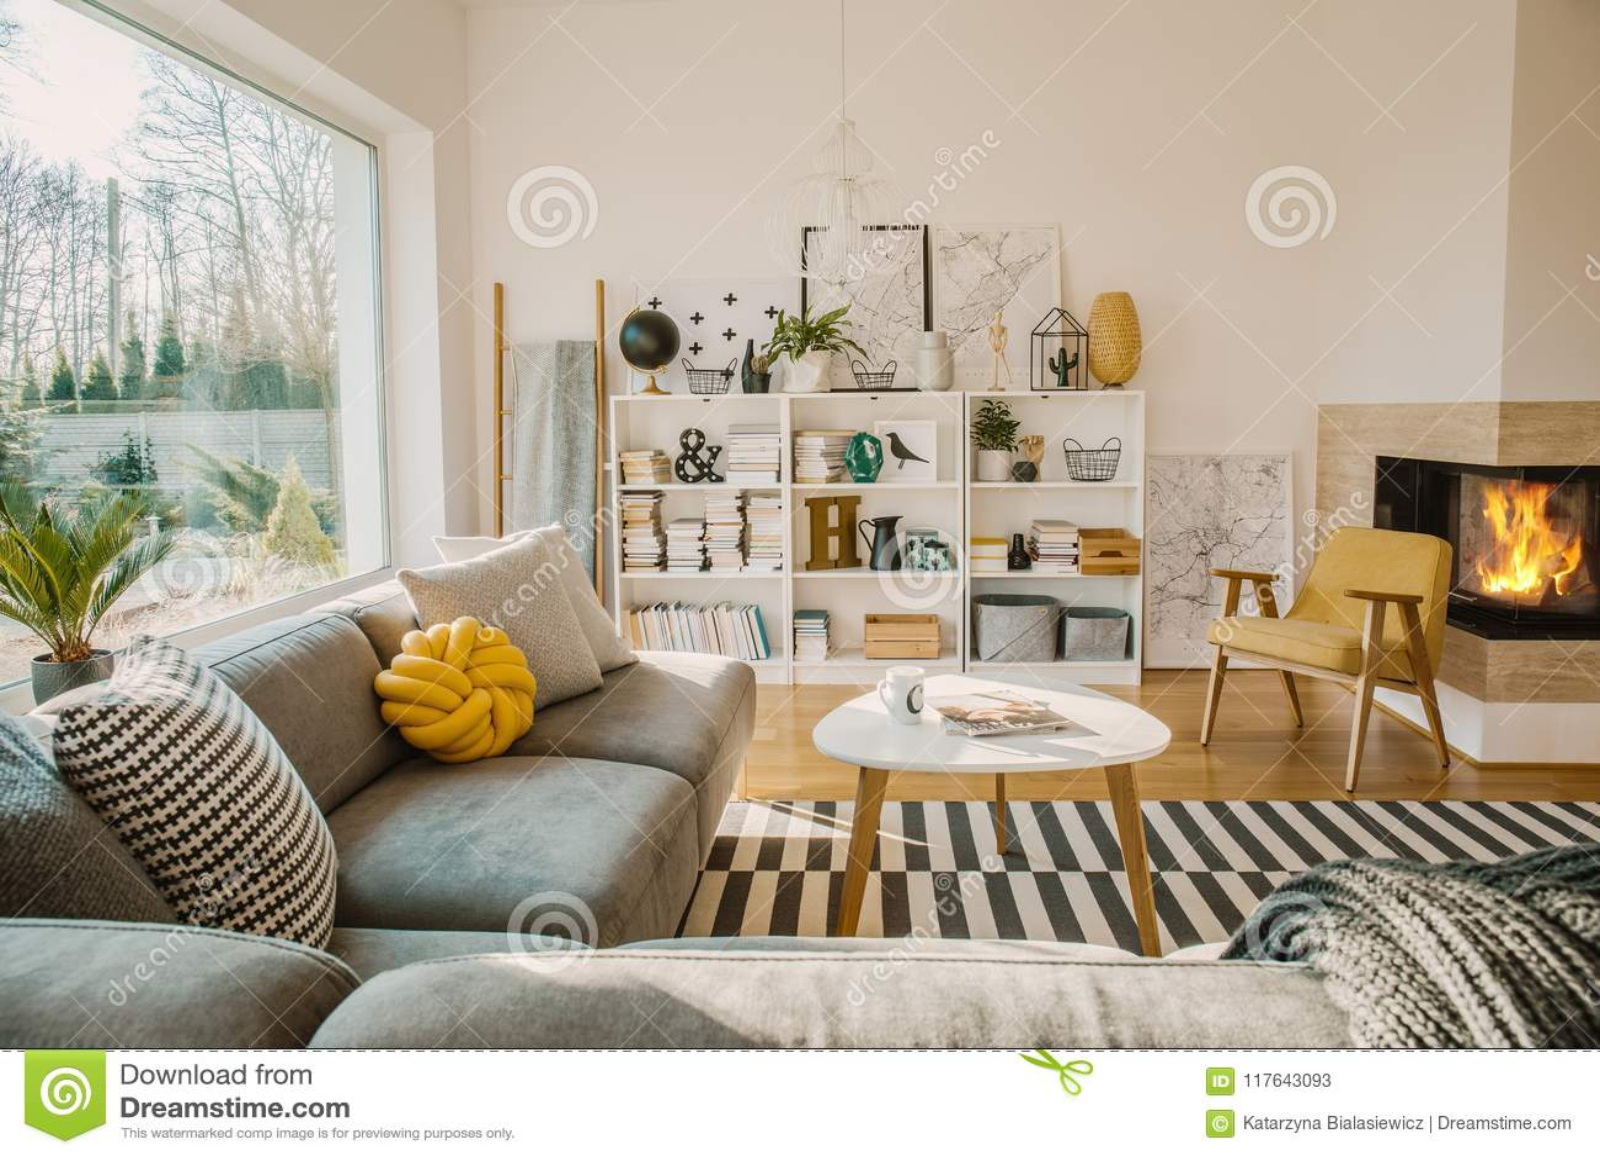 https www dreamstime com white wooden rack books decorations fresh plants simp simple posters bright scandinavian living room interior image117643093